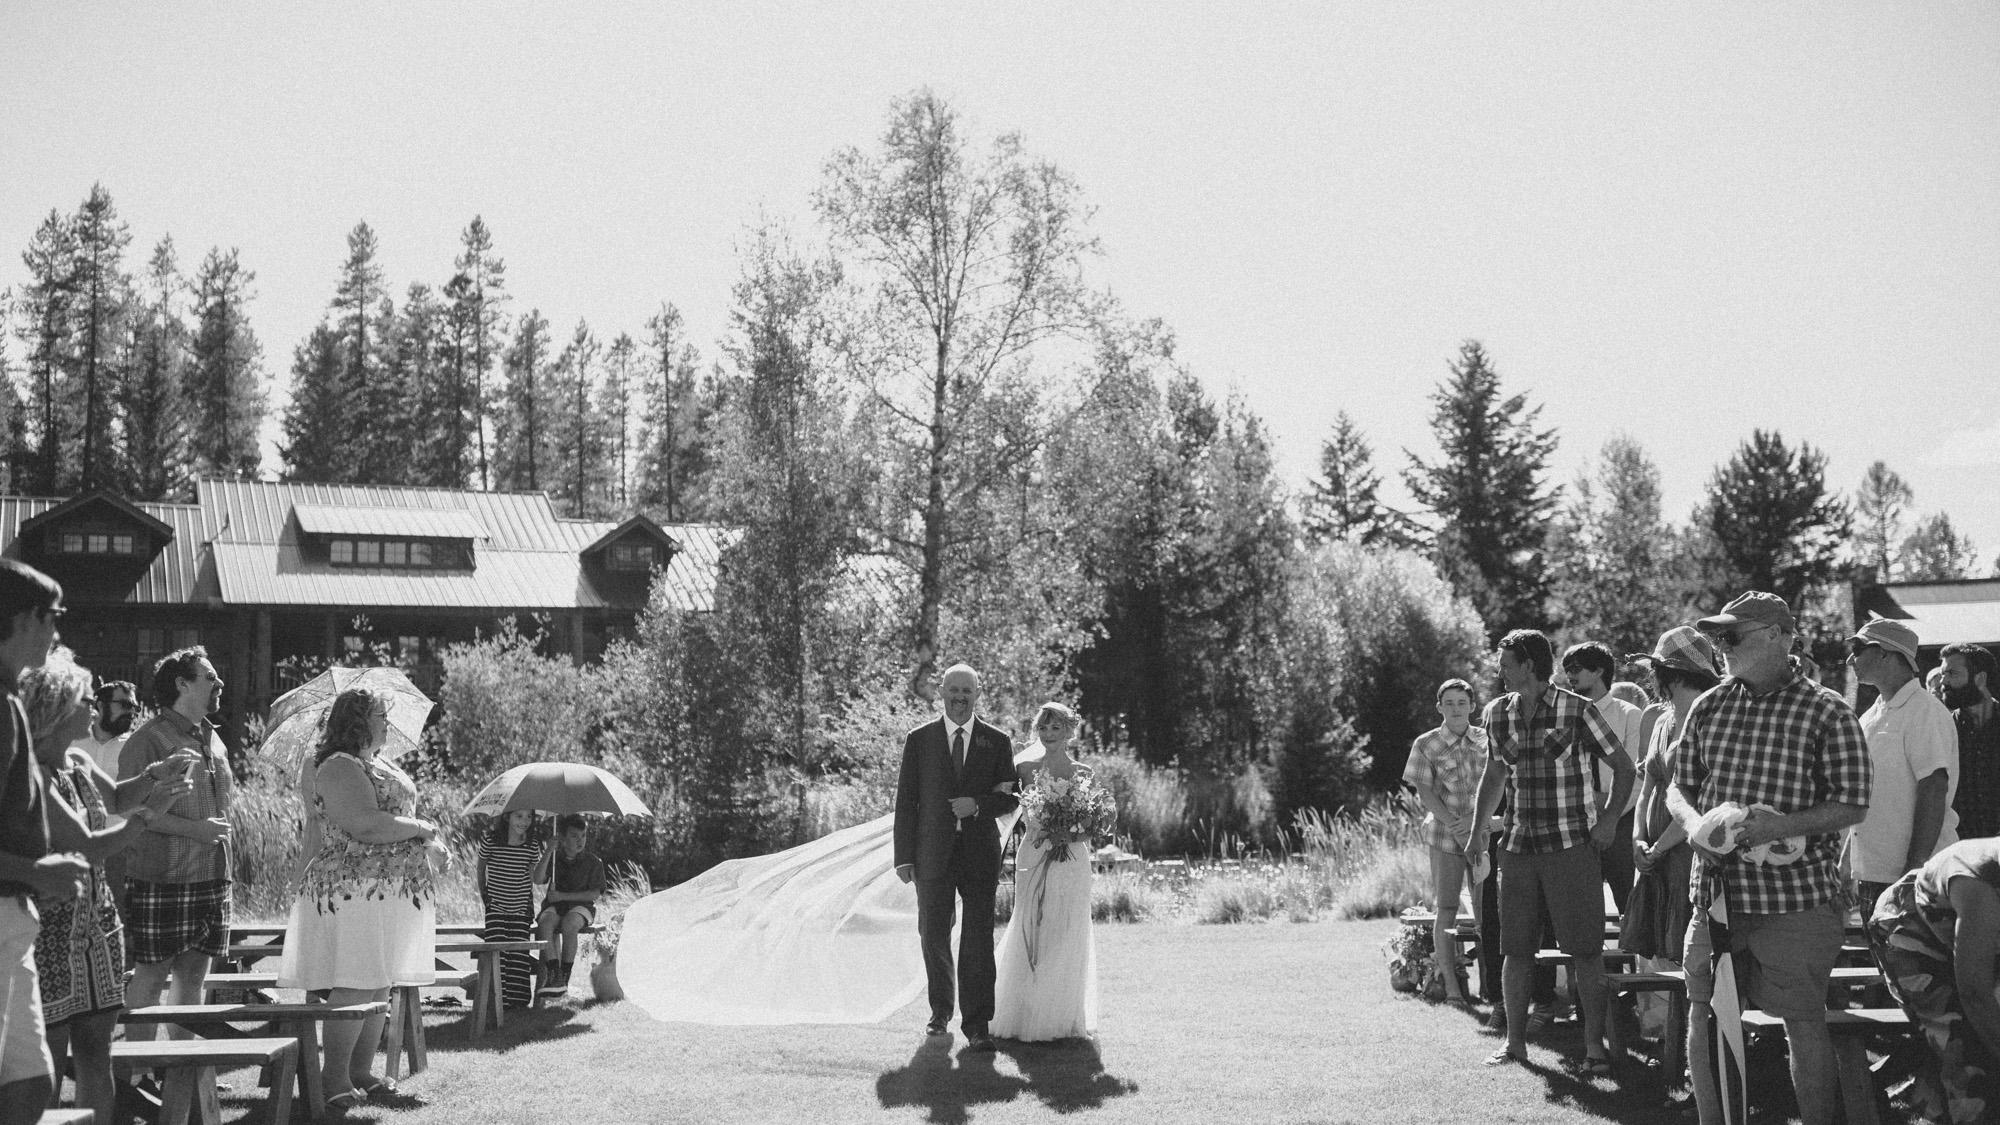 Montana_Wedding_Photos_alec_vanderboom-0084.jpg